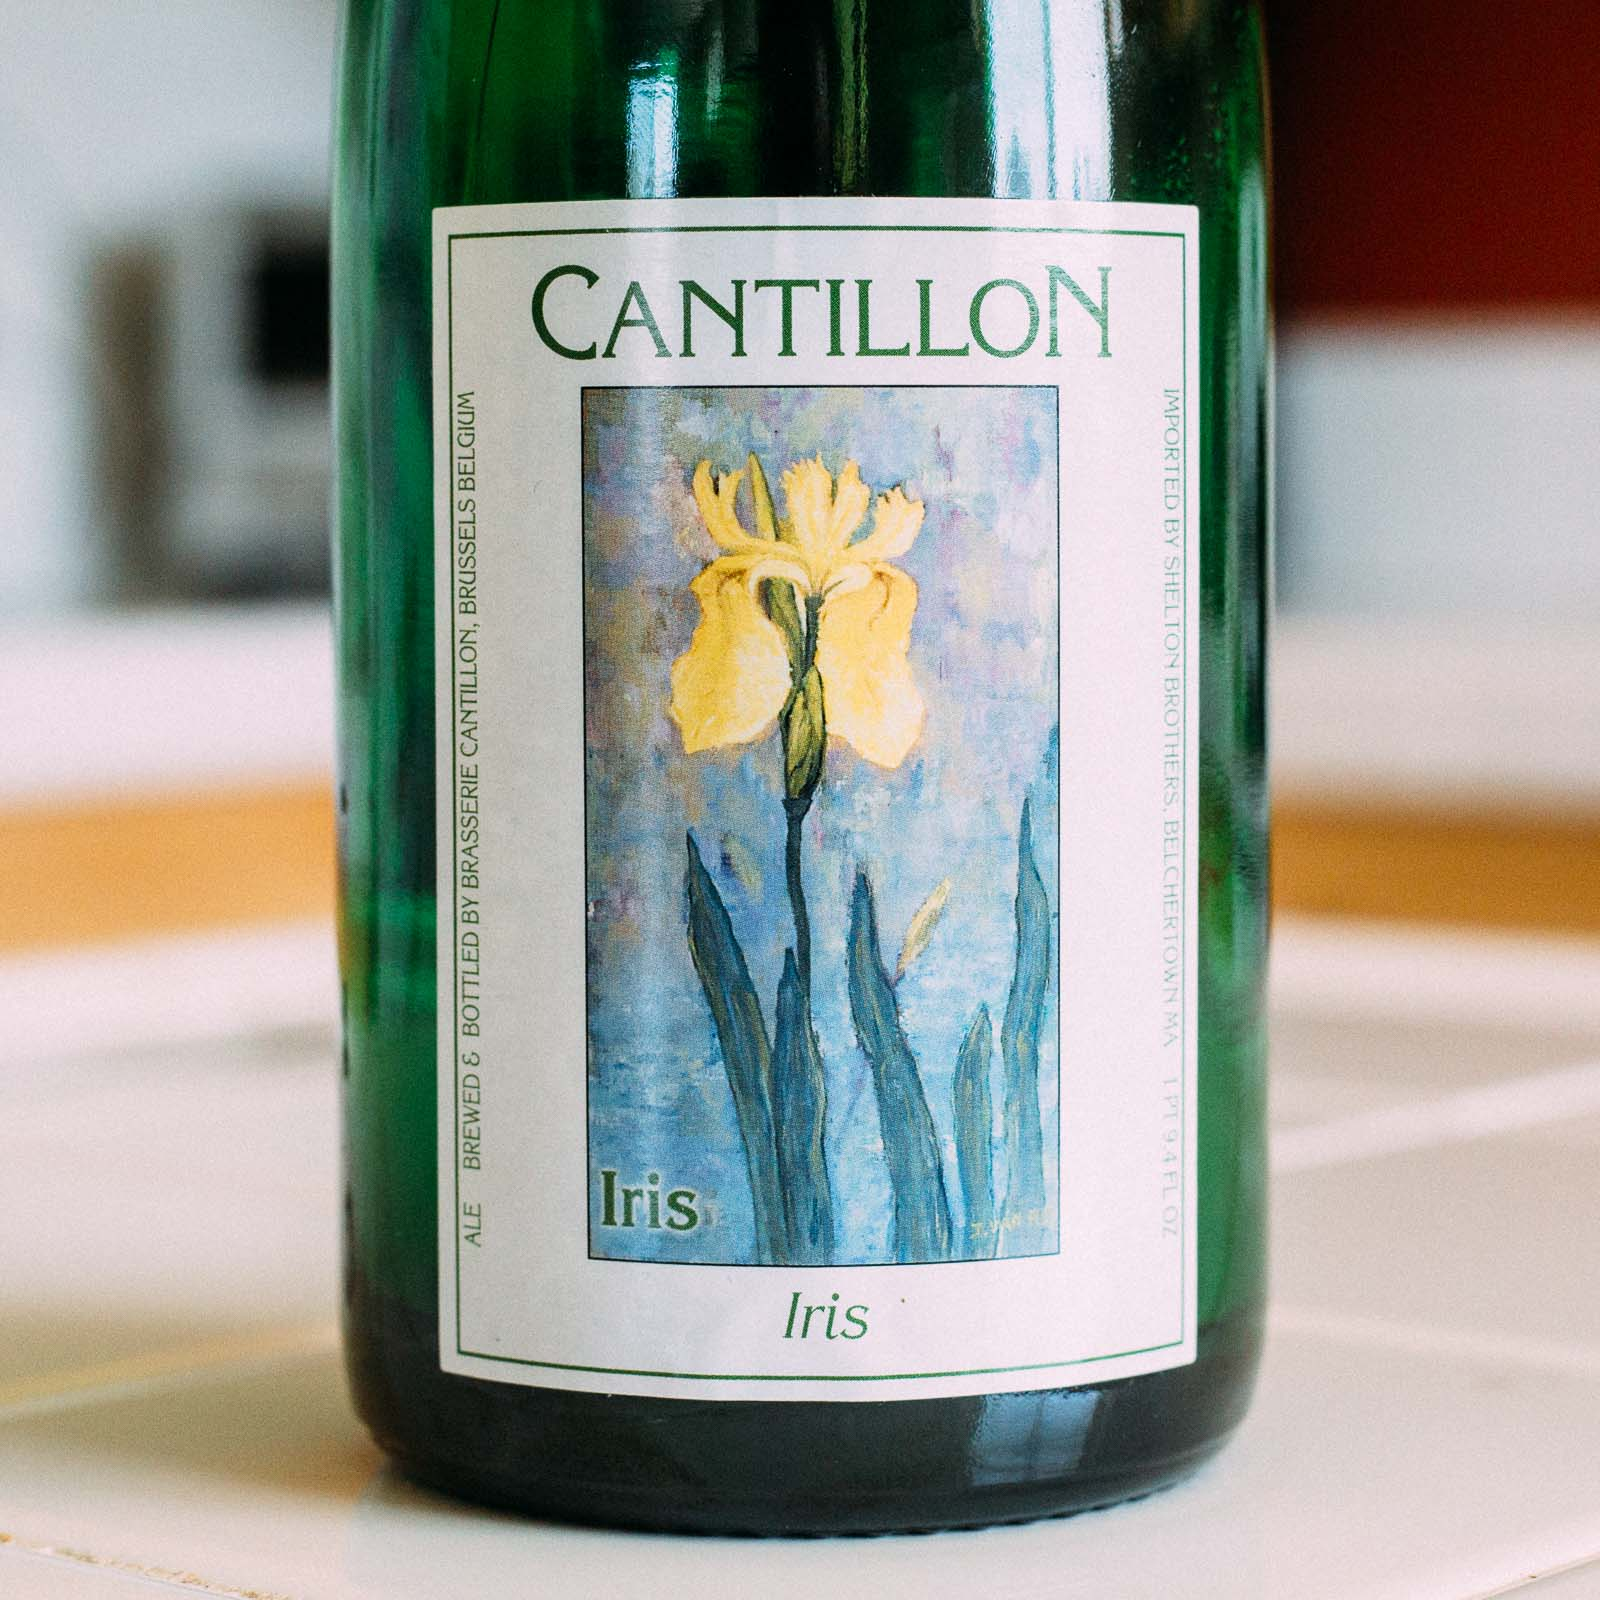 Brasserie Cantillon - Iris